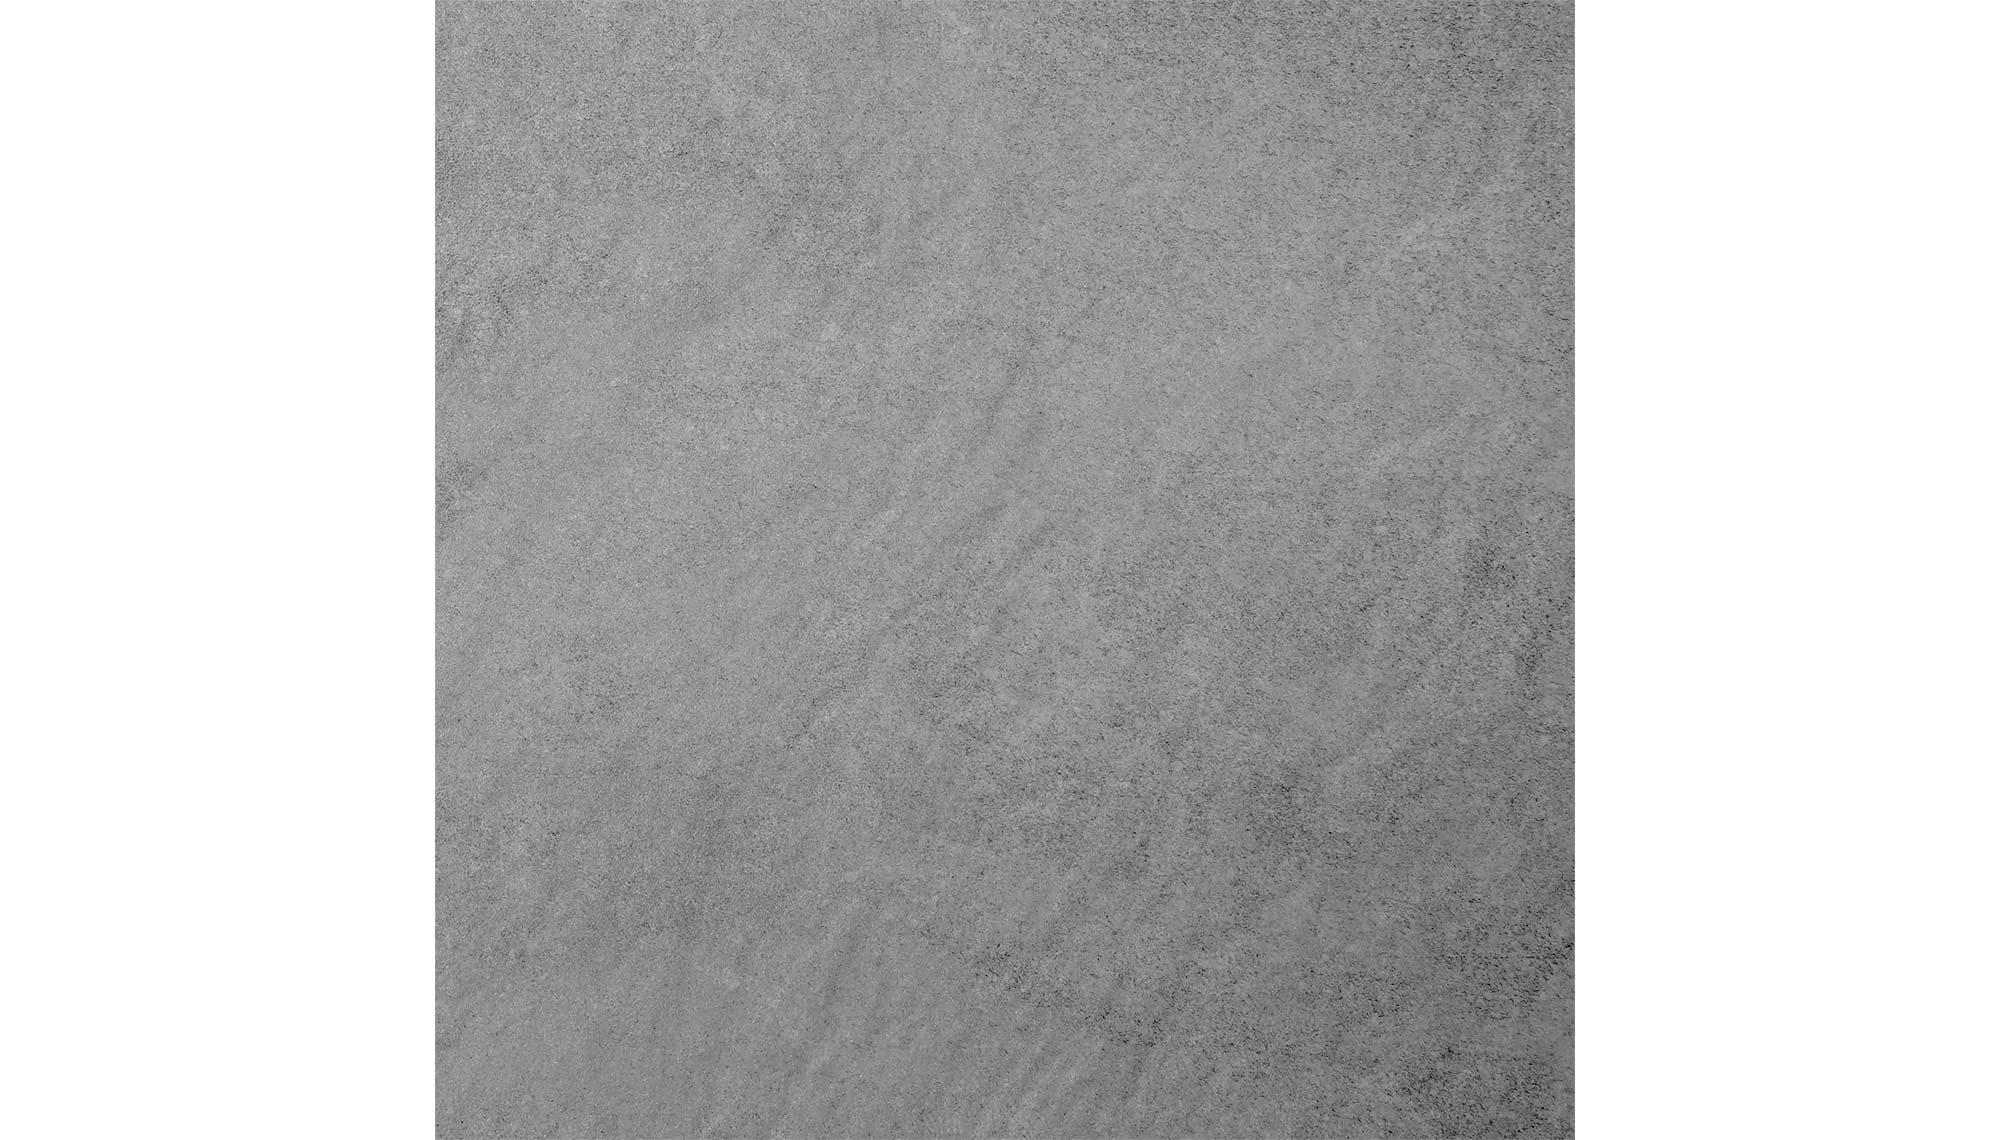 Fußboden Um 2 Cm Erhöhen ~ Schlüter bekotec en f verarbeitung schlüter systems